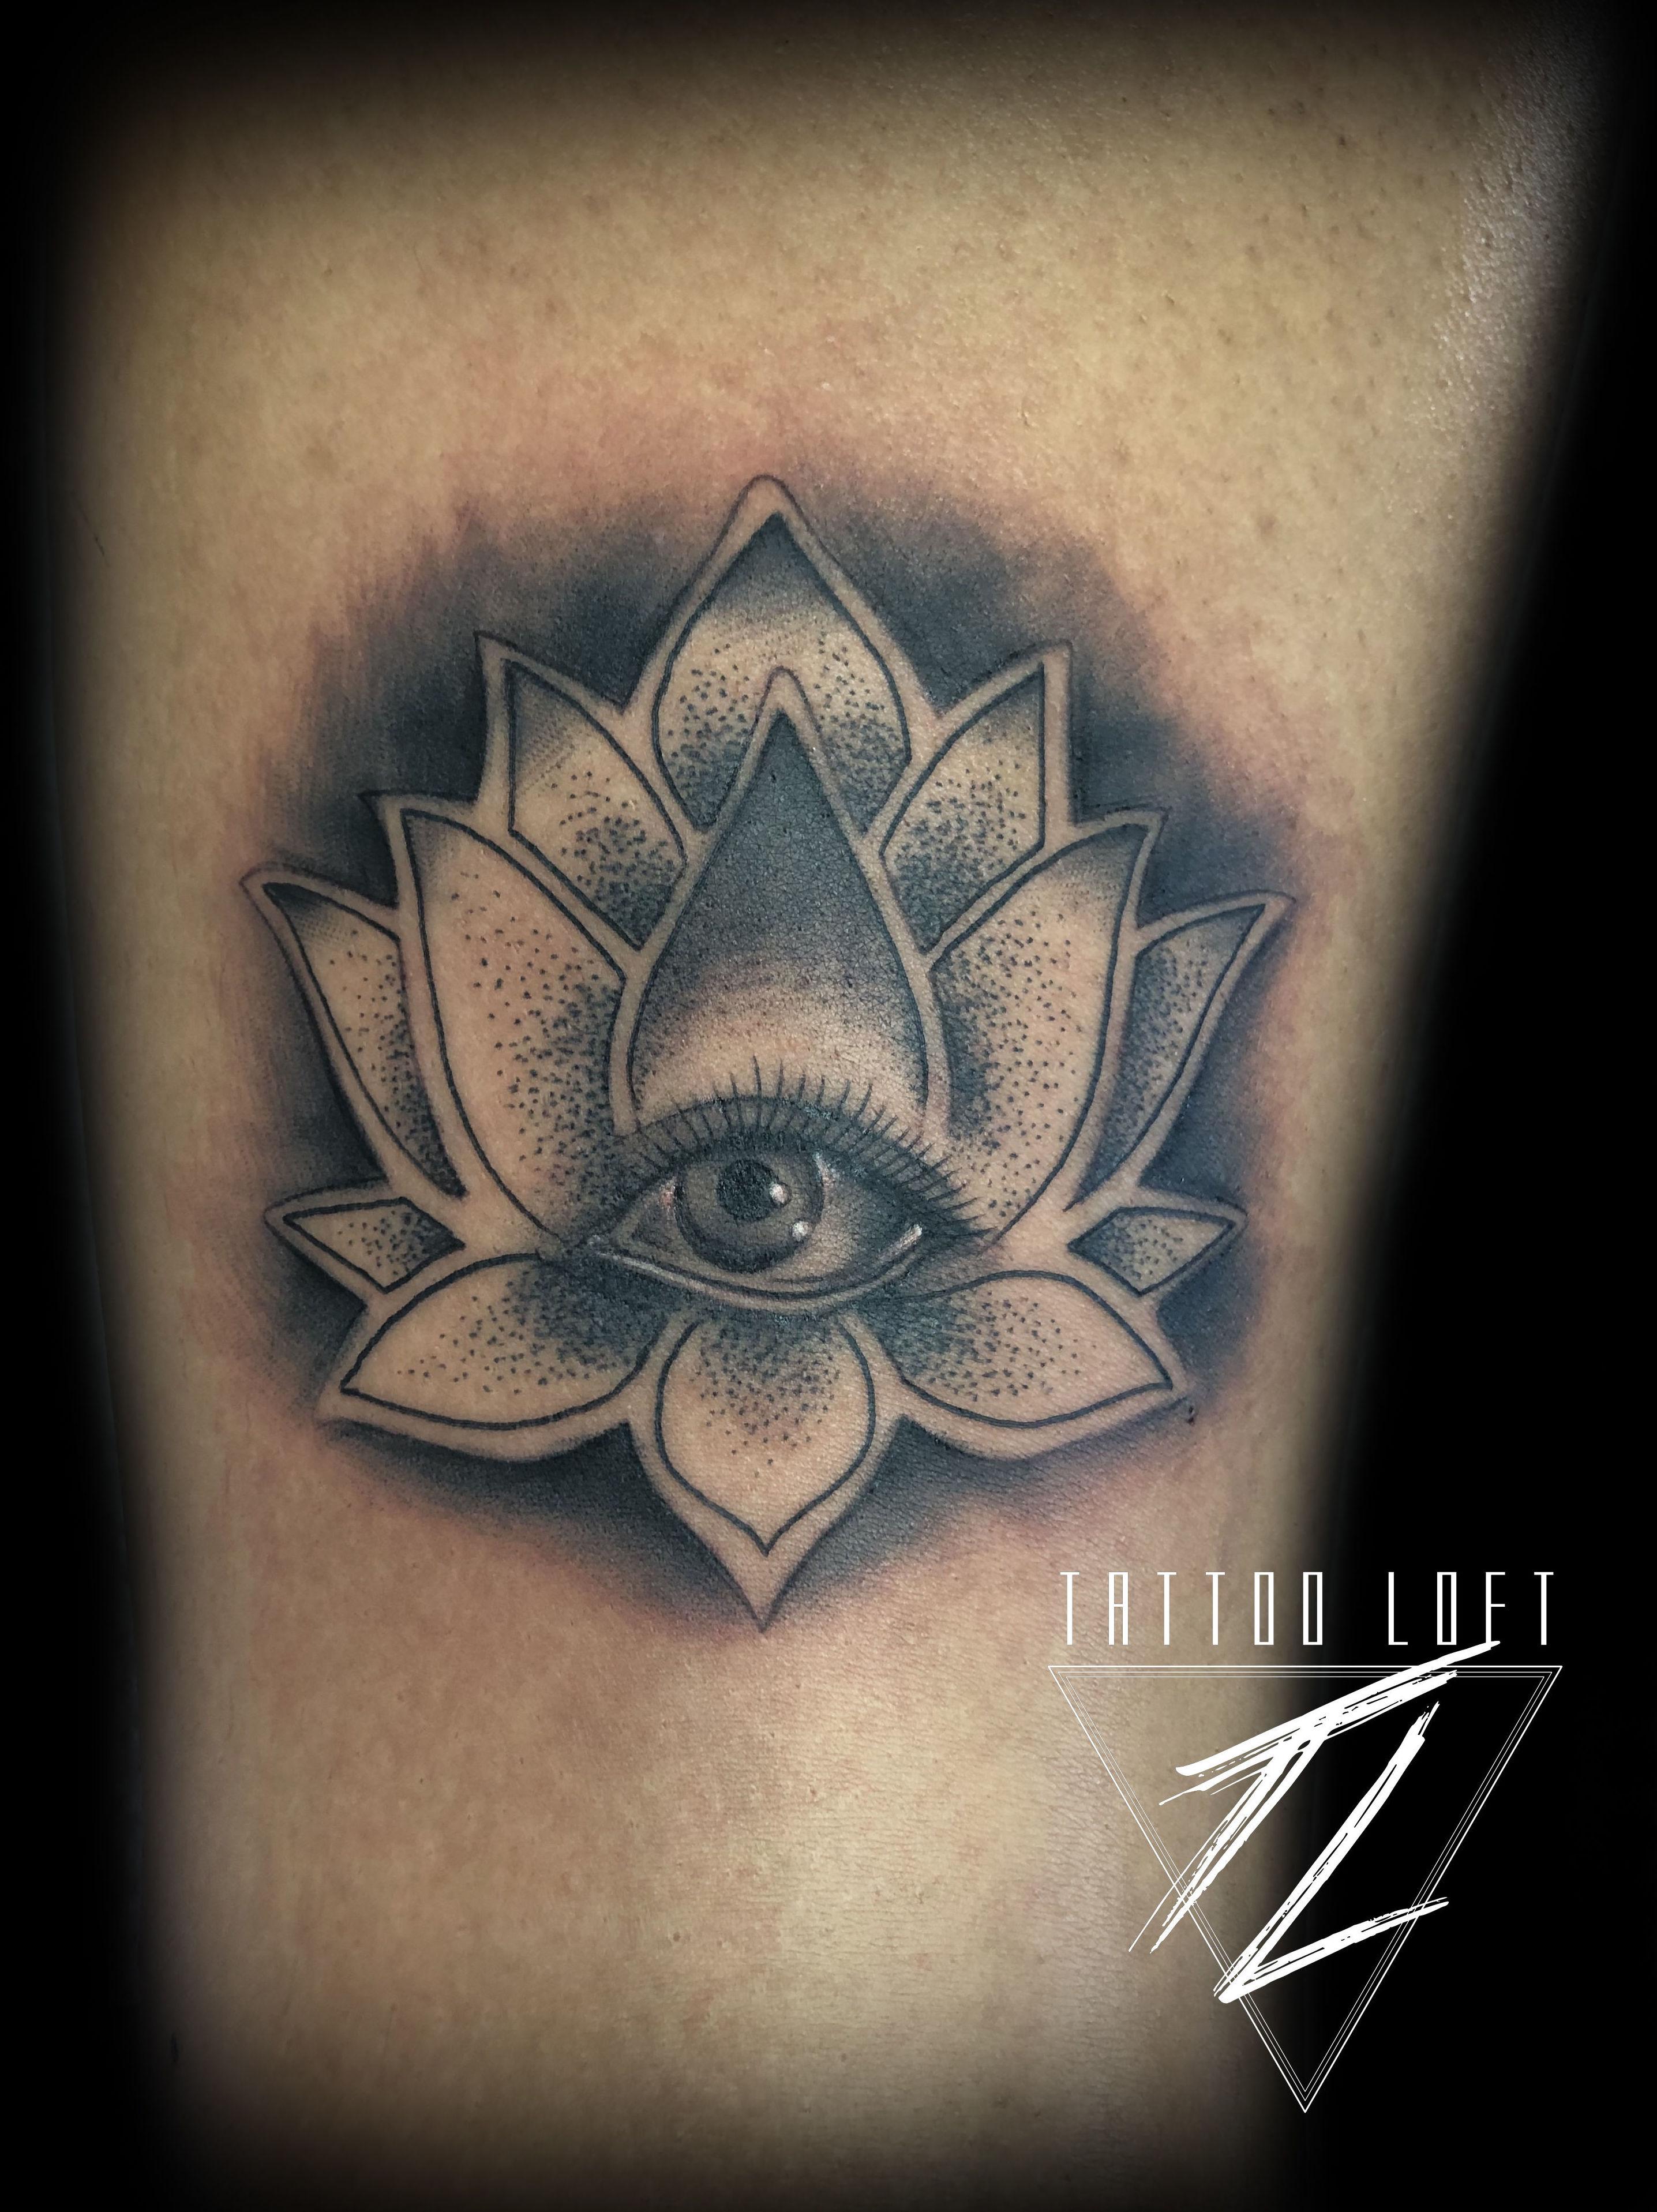 Foto 68 de Estudio artístico de tatuaje en  | Tattoo Loft